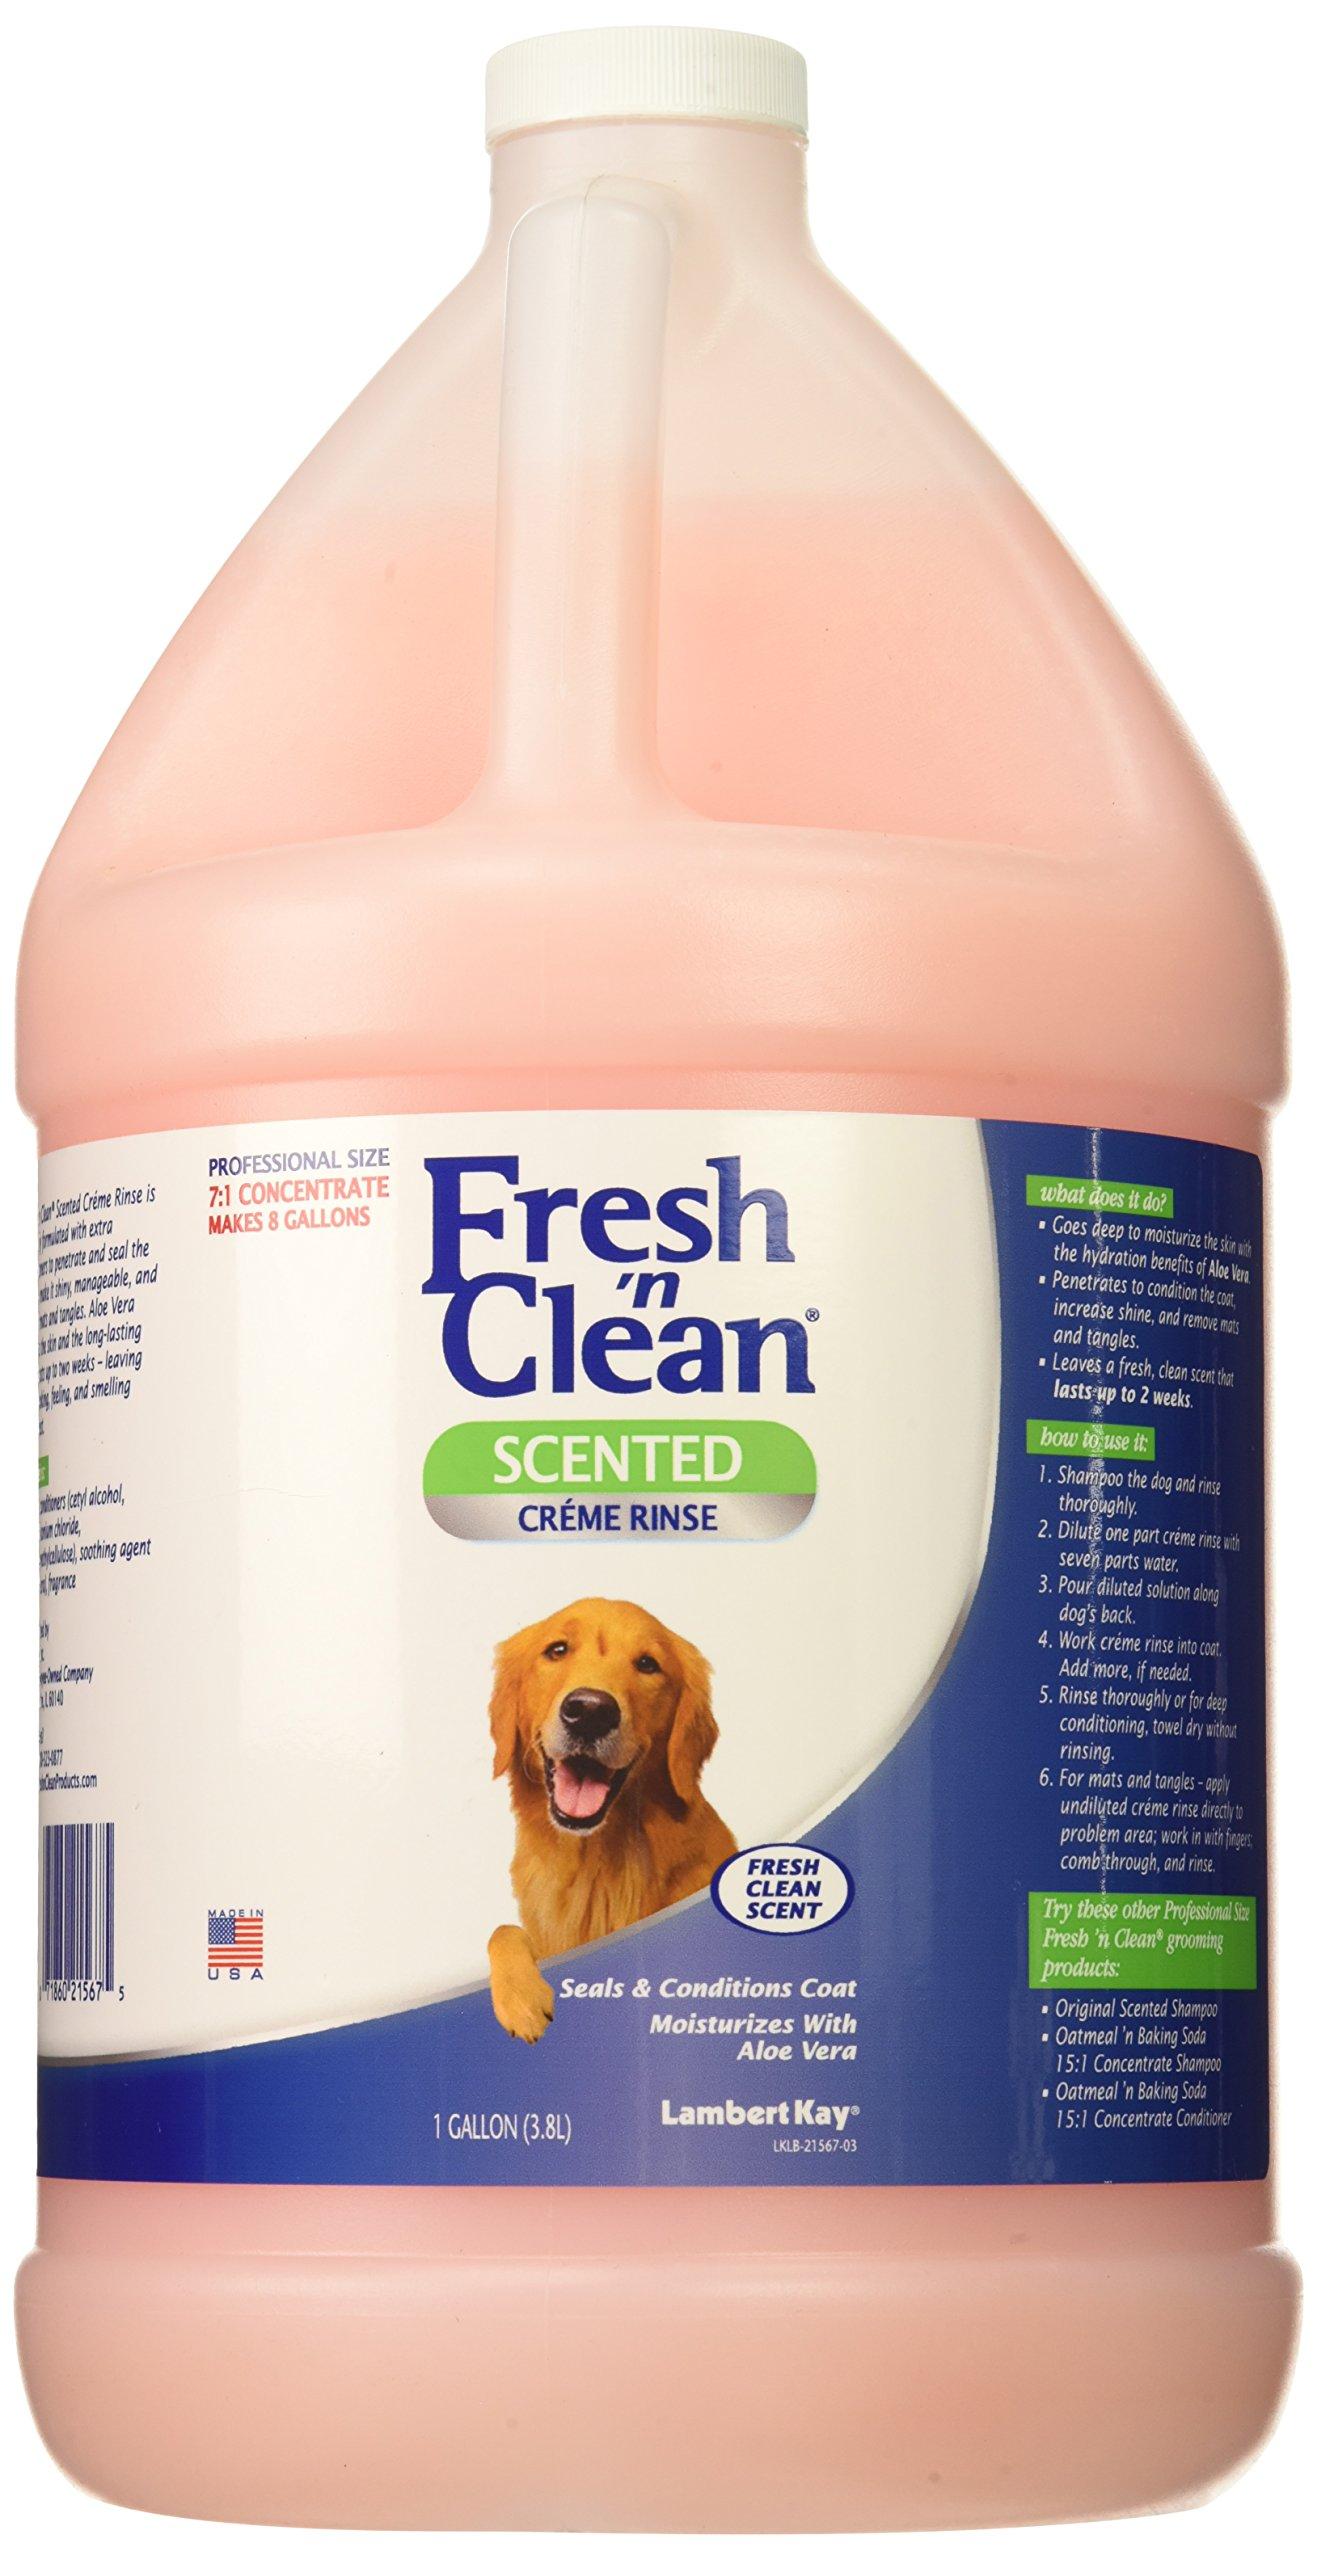 Lambert Kay Fresh N Clean Creme Rinse by Lambert Kay